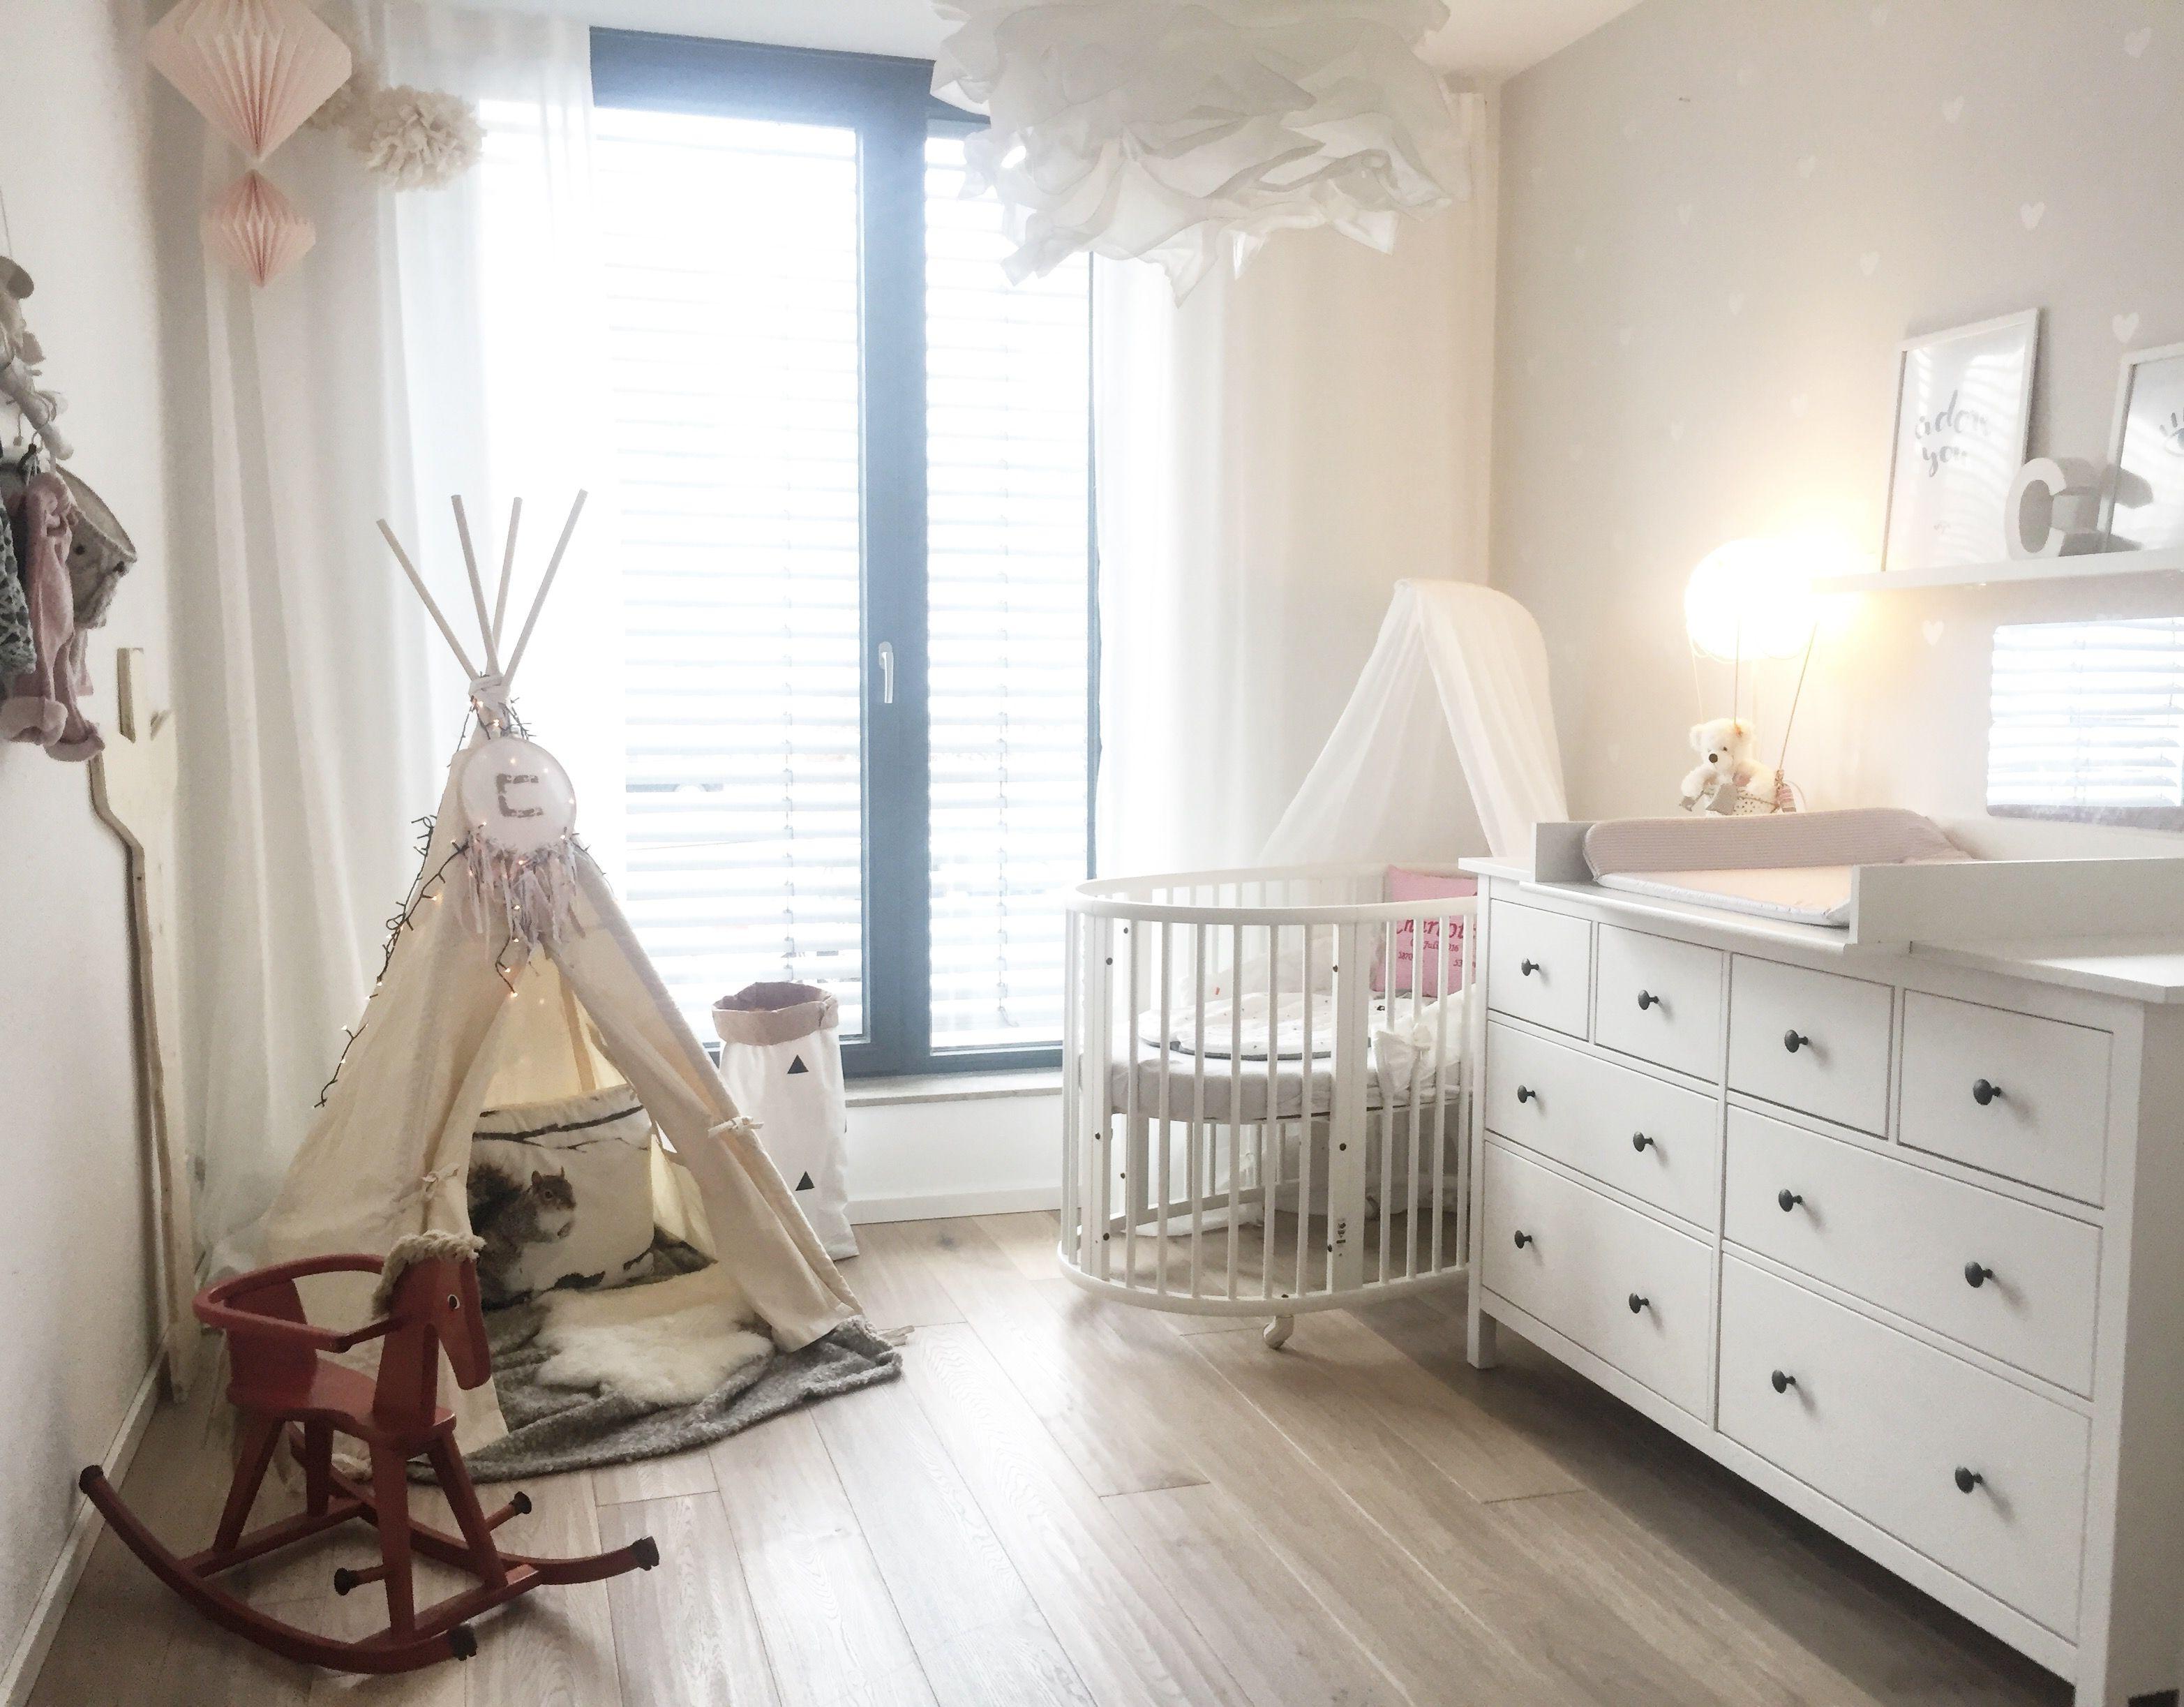 Kinderzimmer babyzimmer tipi Indianer Ikea Hemnes wickelkommode ...